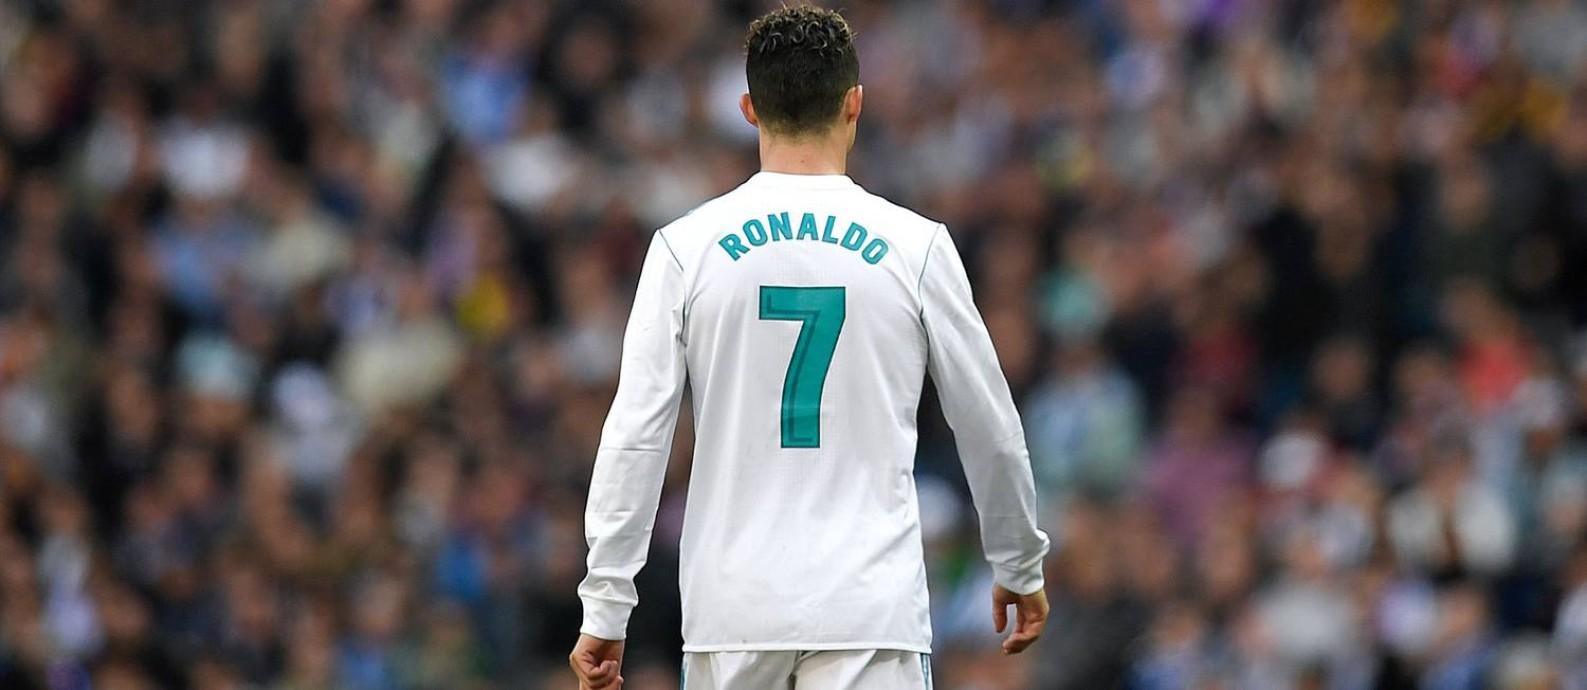 Cristiano Ronaldo deixa o Real Madrid após nove anos Foto  GABRIEL BOUYS    AFP ca24768aaa2a8